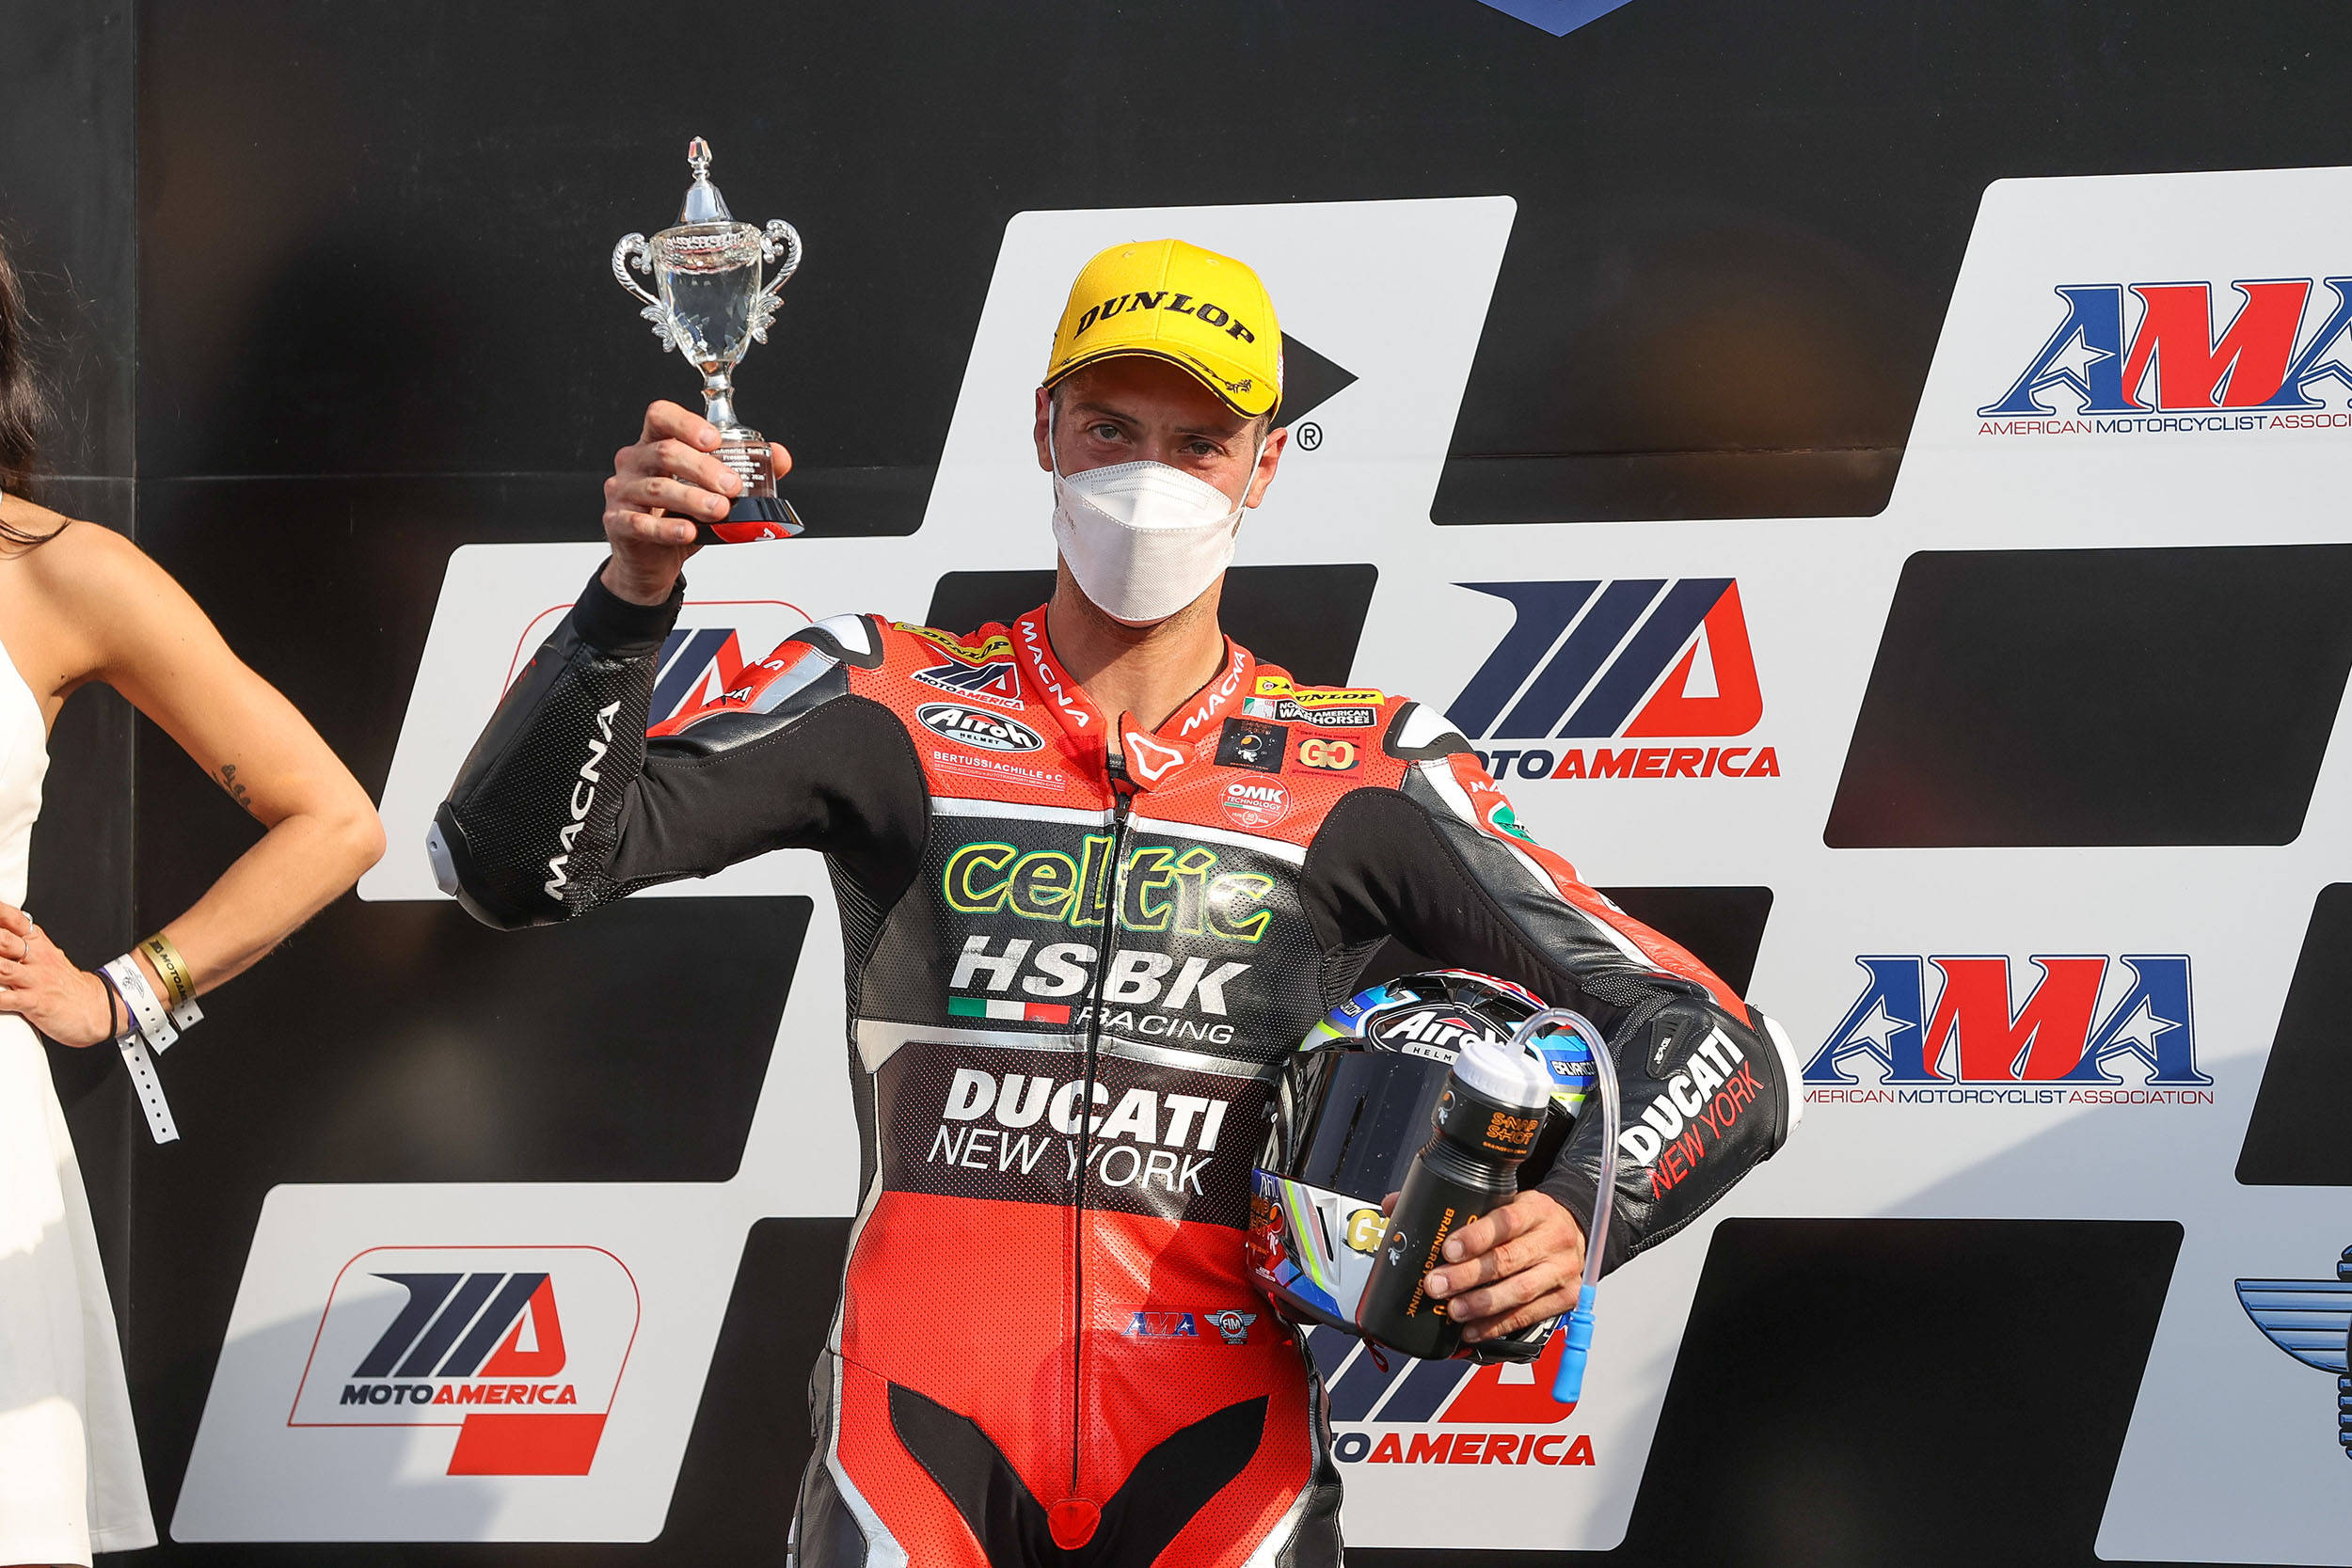 201012 MotoAmerica - Superbike – Lorenzo Zanetti #87 (2)